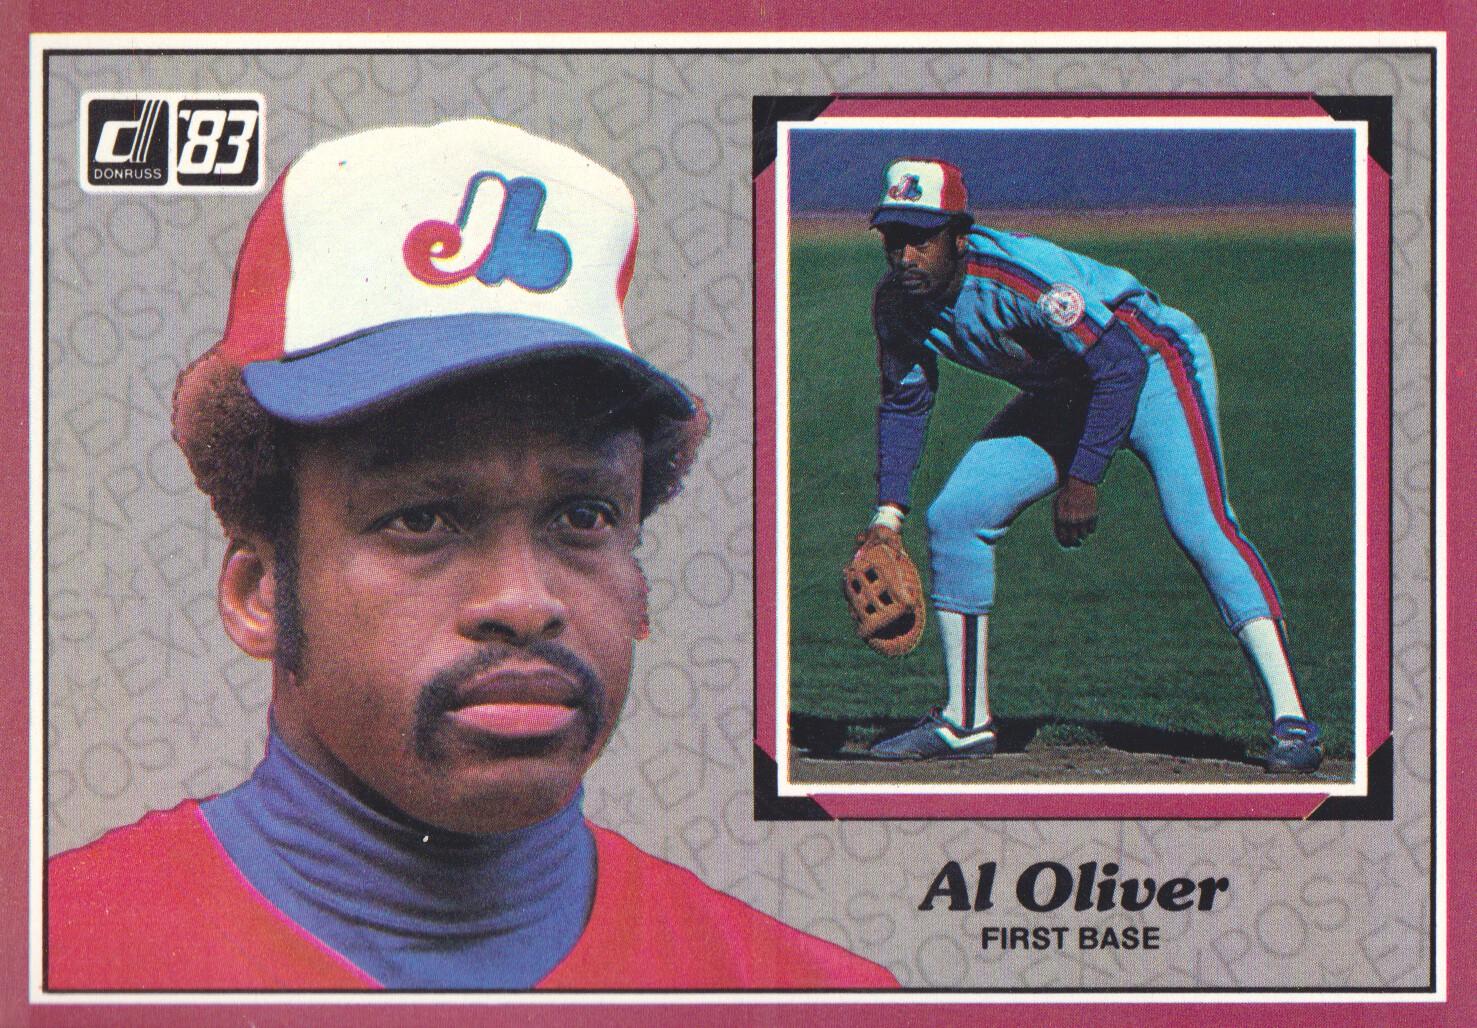 1983 Donruss Action All-Stars #6 Al Oliver